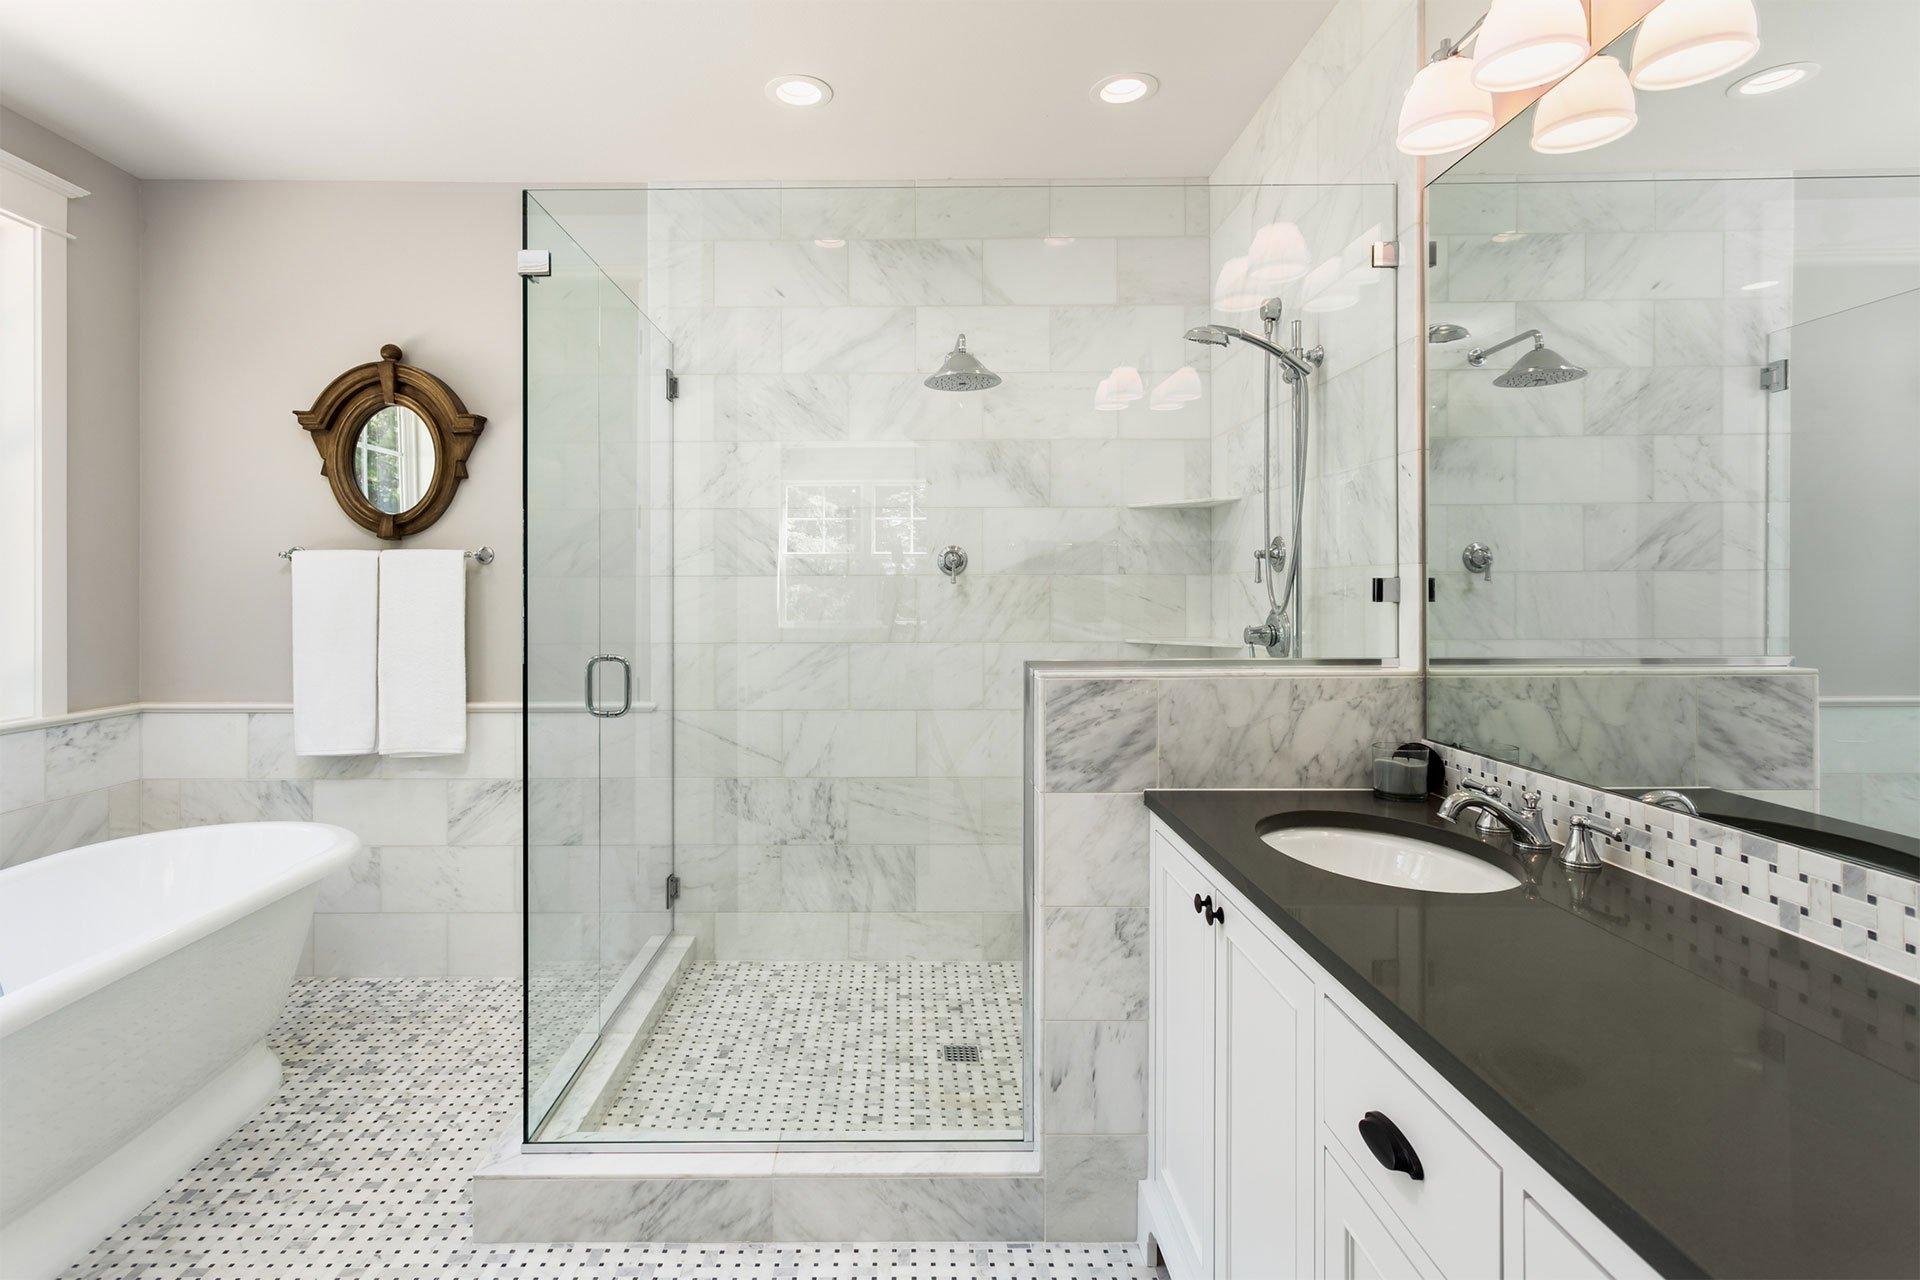 Bathroom Fixtures Buffalo Ny plumbing contractor for cheektowaga & buffalo, ny | sewer cleaning